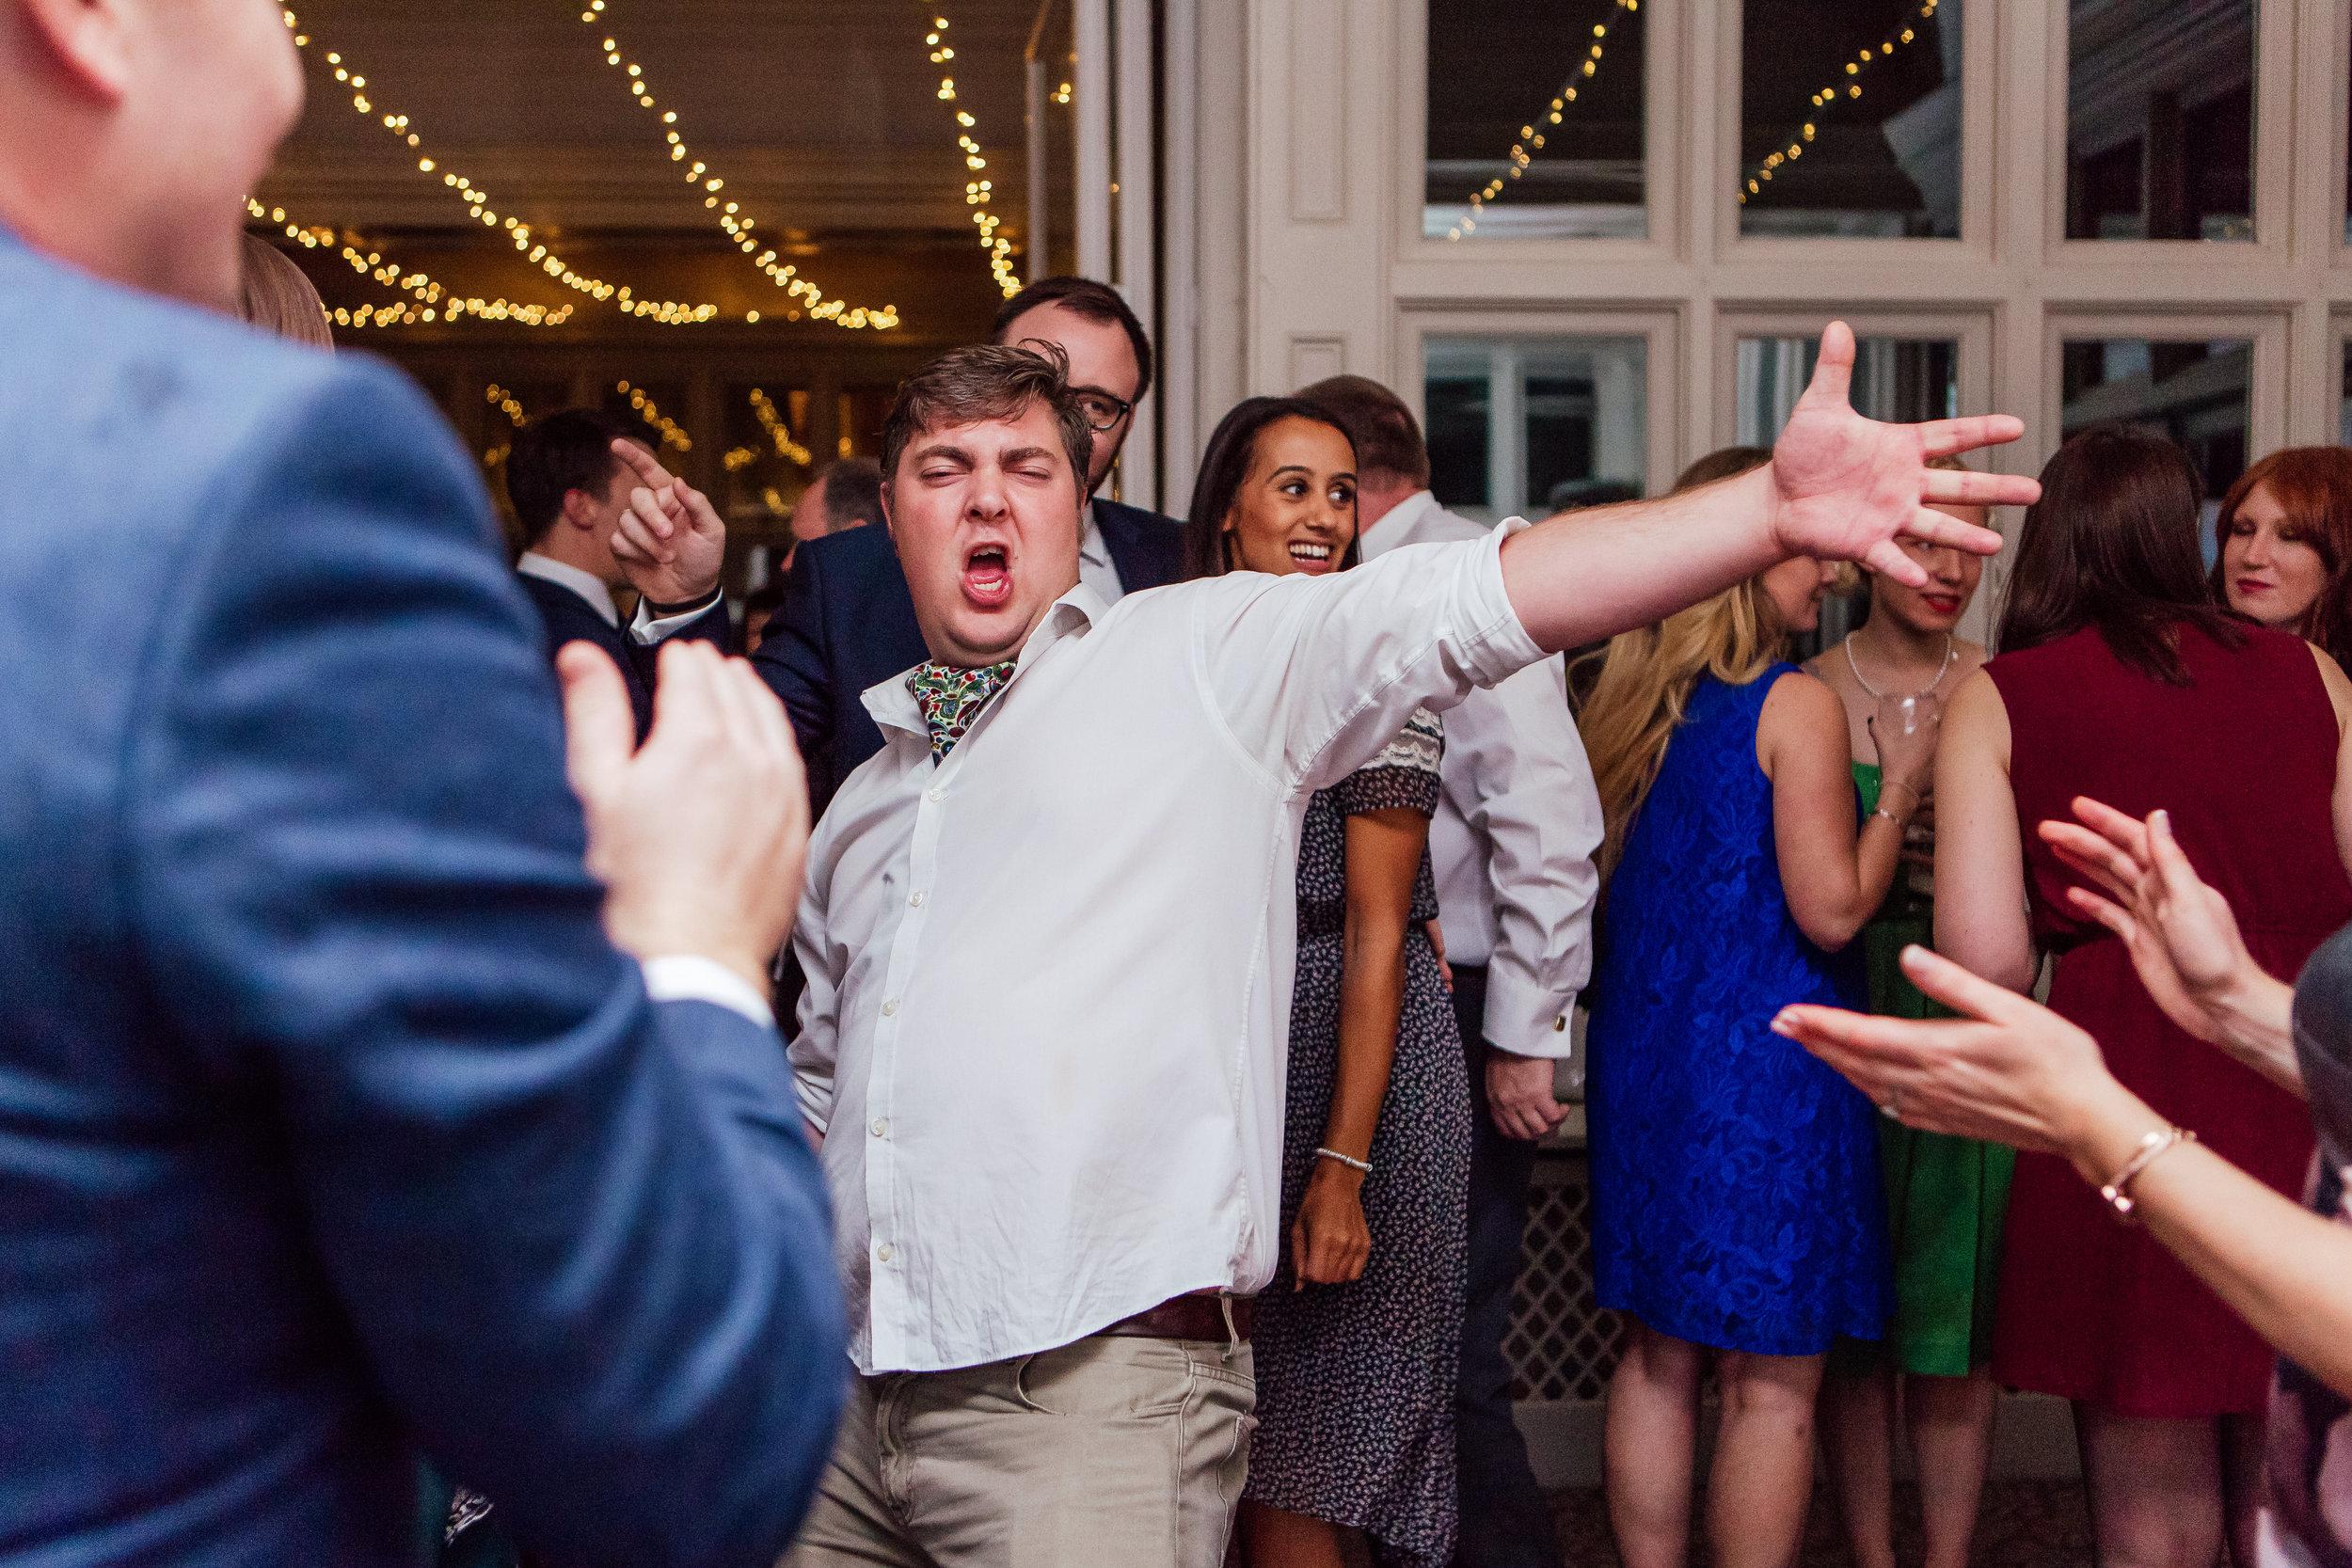 Amy James Photography - Wedding dancing - The Elvetham Fleet Hampshire - Documentary wedding photographer Hampshire